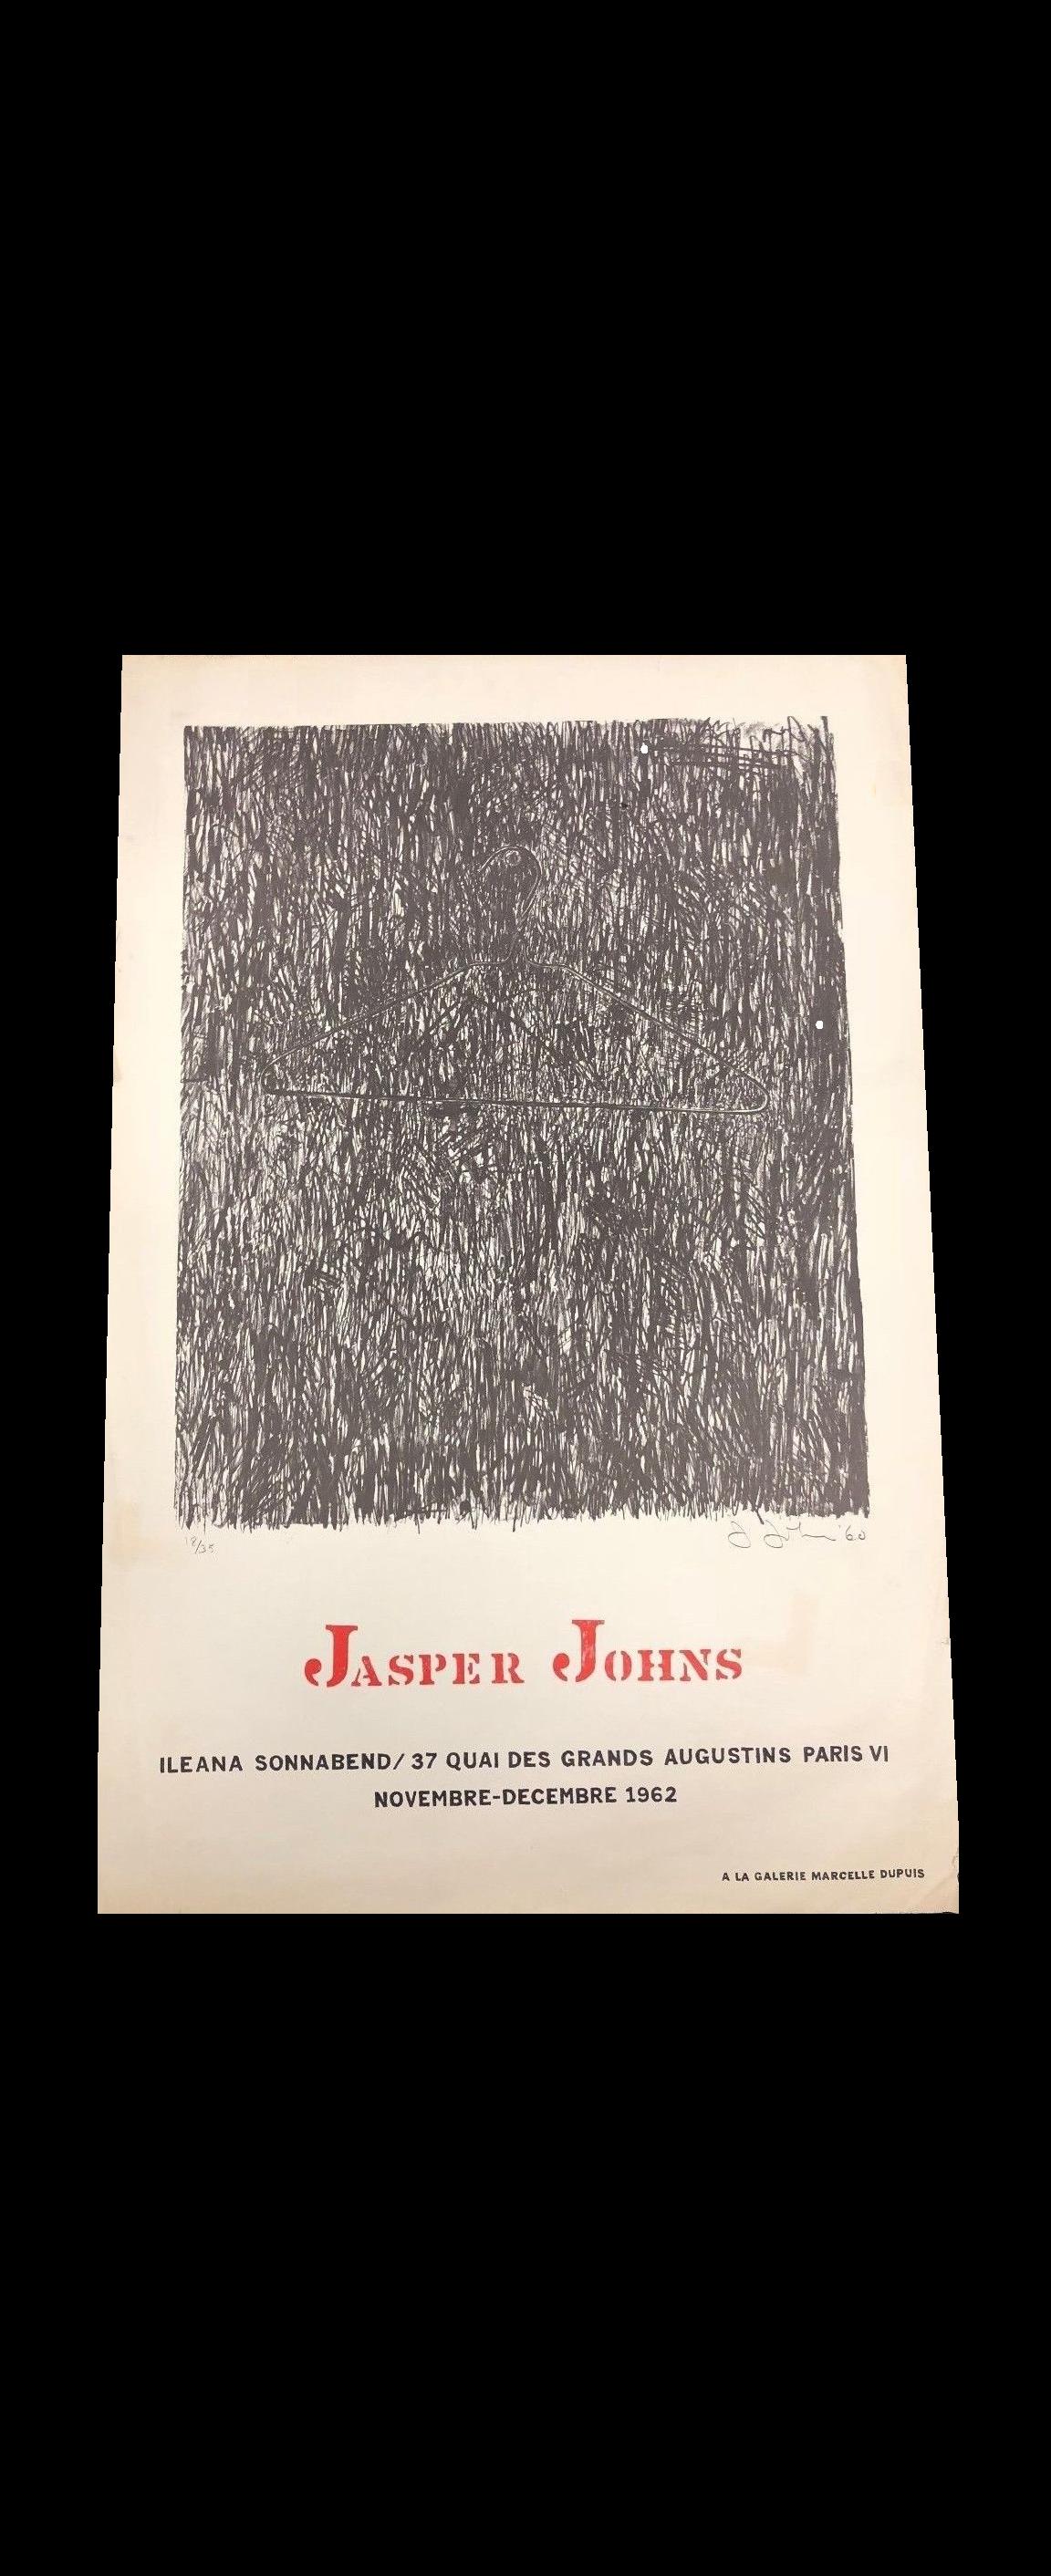 """JASPER JOHNS"",  1962, Exhibition Poster, Ileana Sonnabend Paris., 31-9/10 × 21-3/10 in. (81 × 54 cm)"